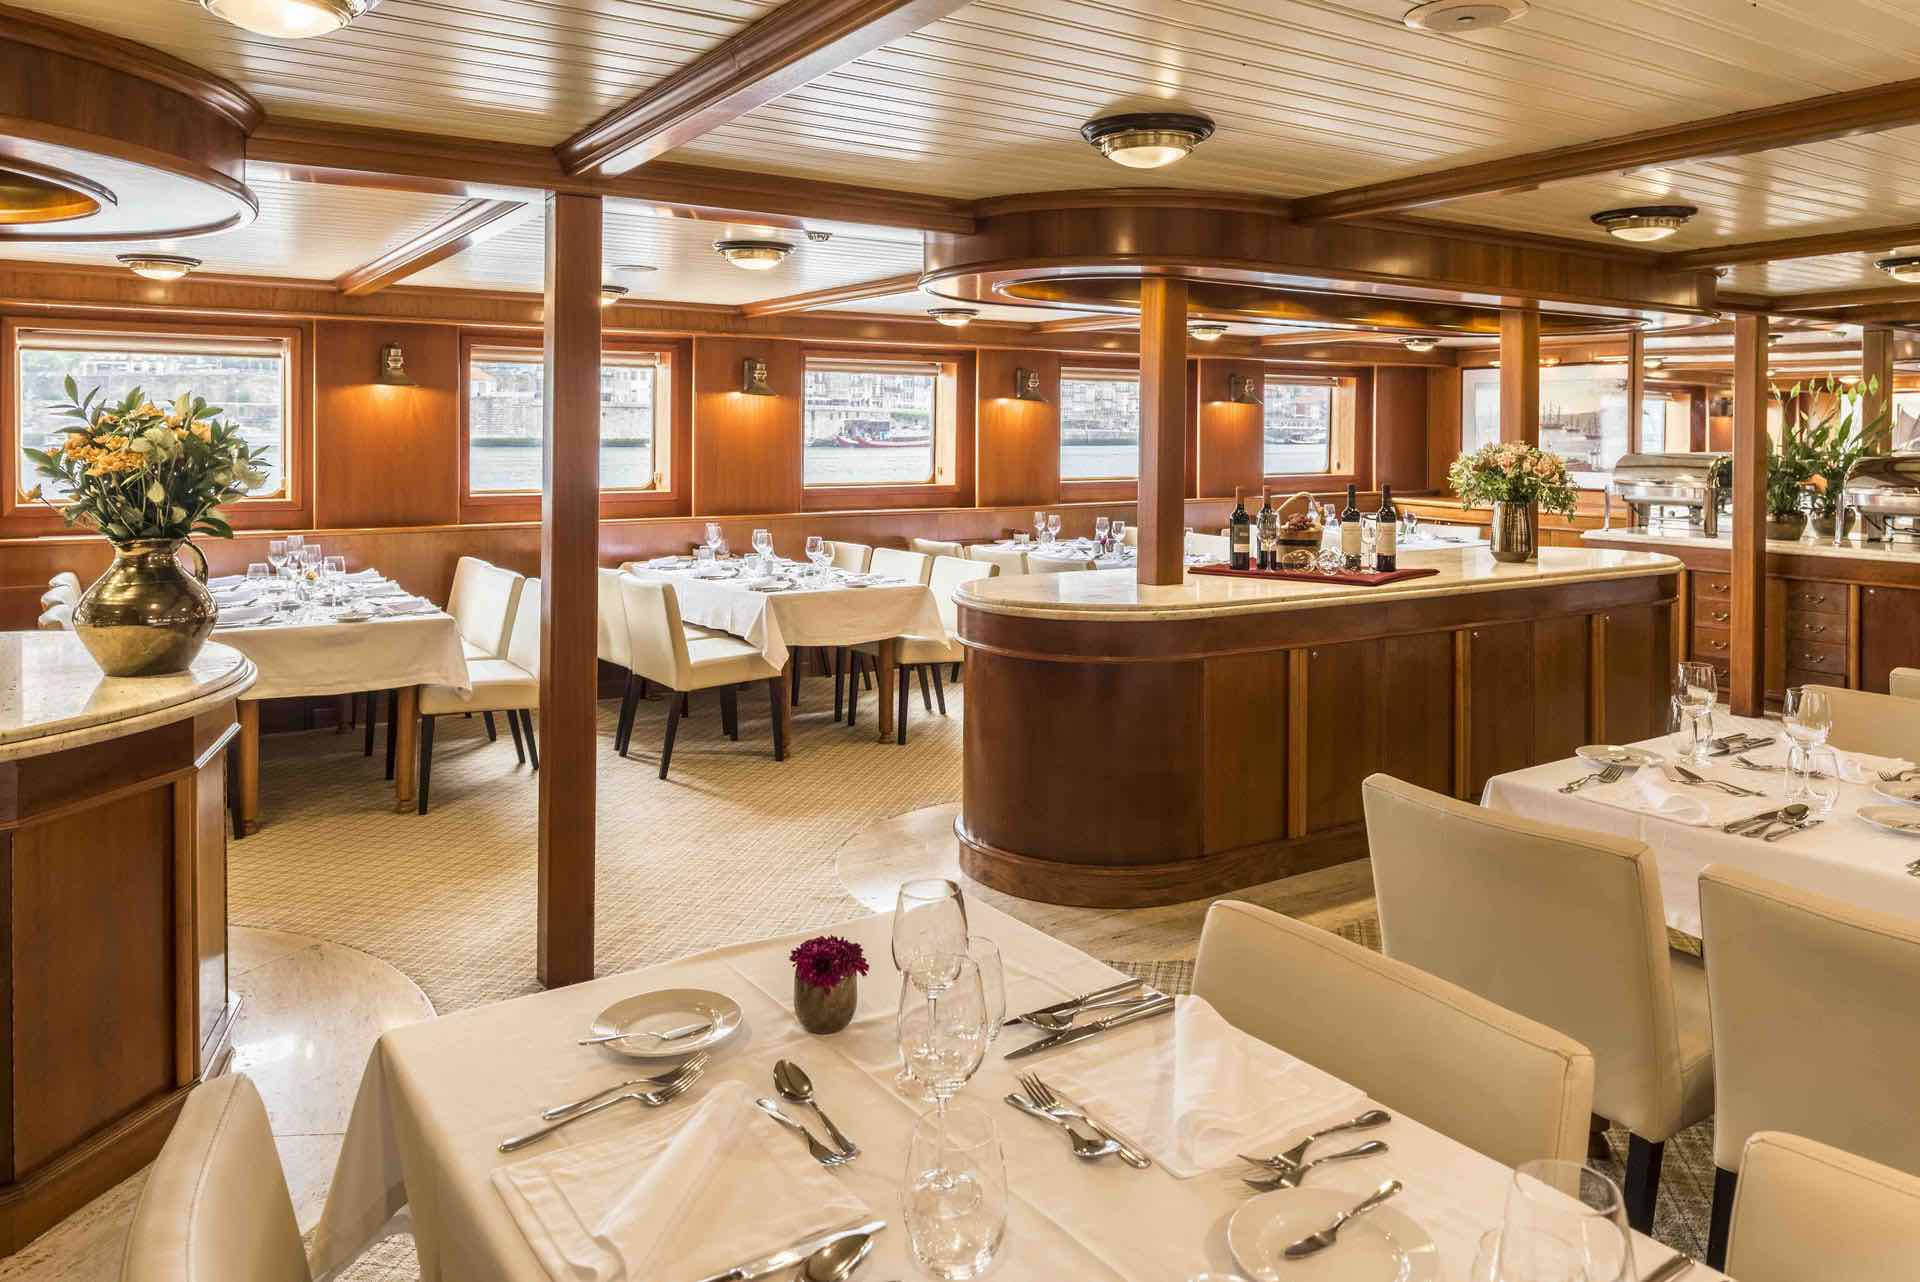 MS Douro Prince Panorama Restaurant